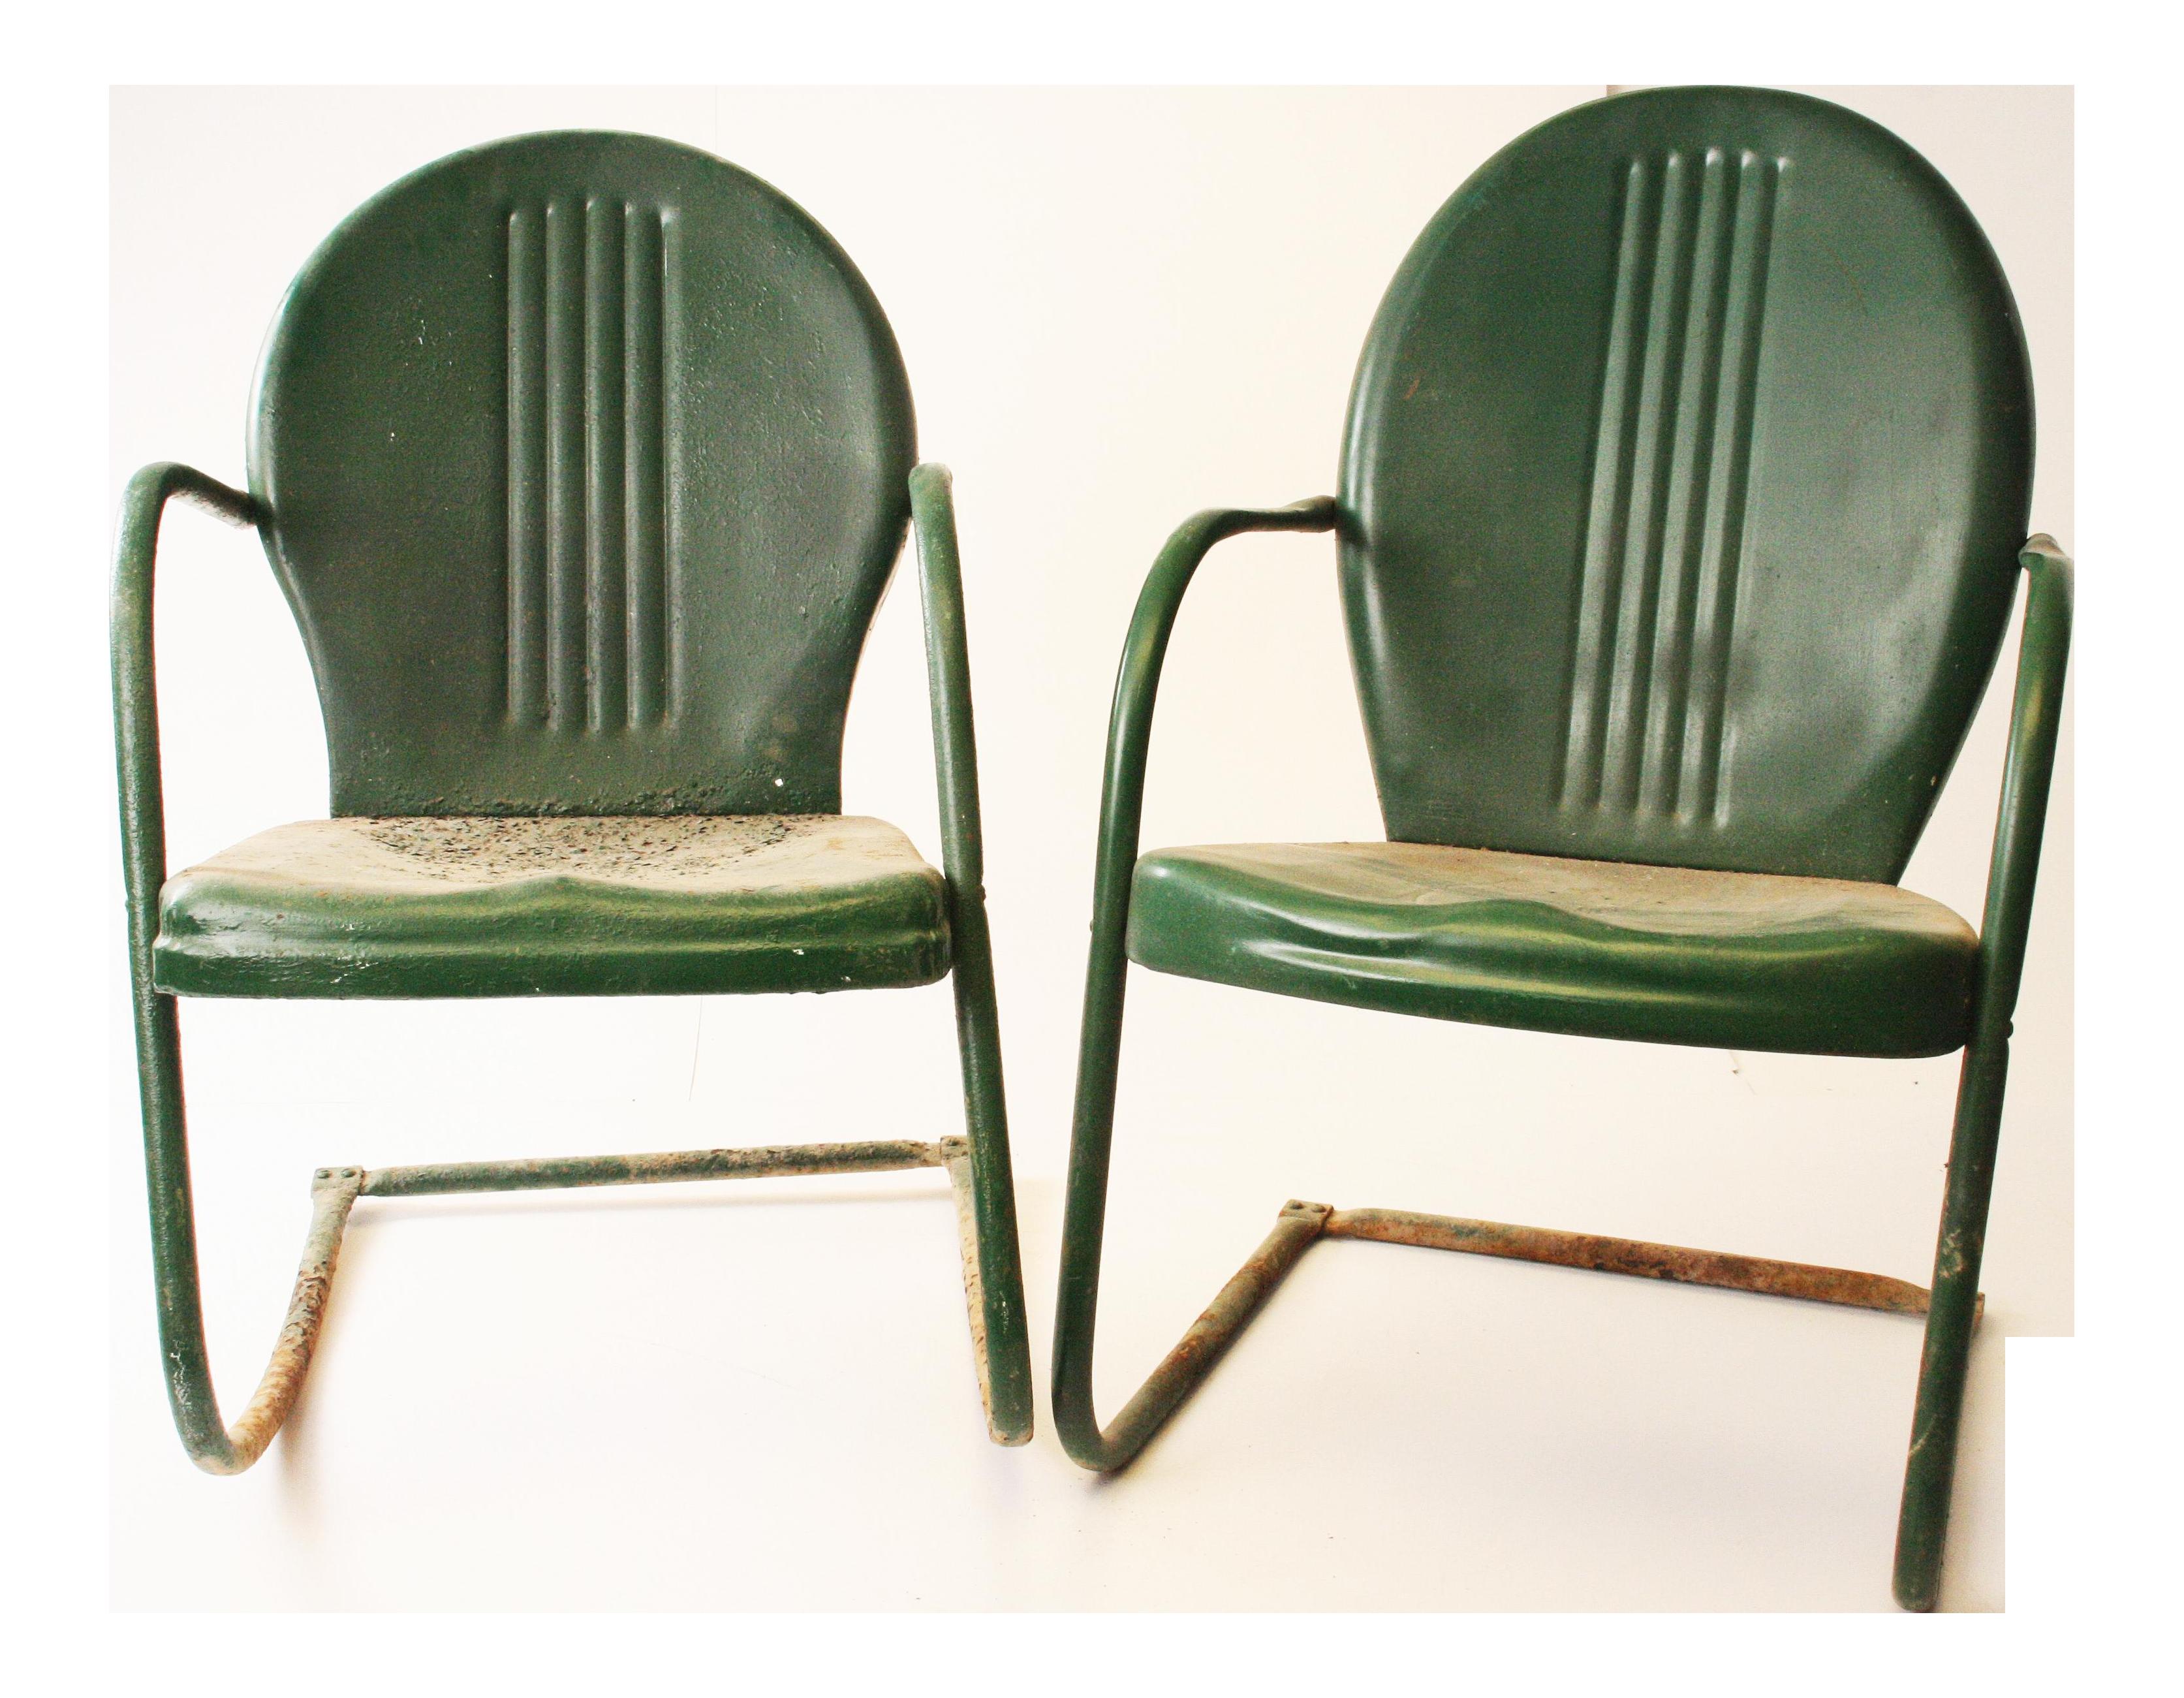 Vintage Mid Century Metal Dark Green Patio Chairs   A Pair